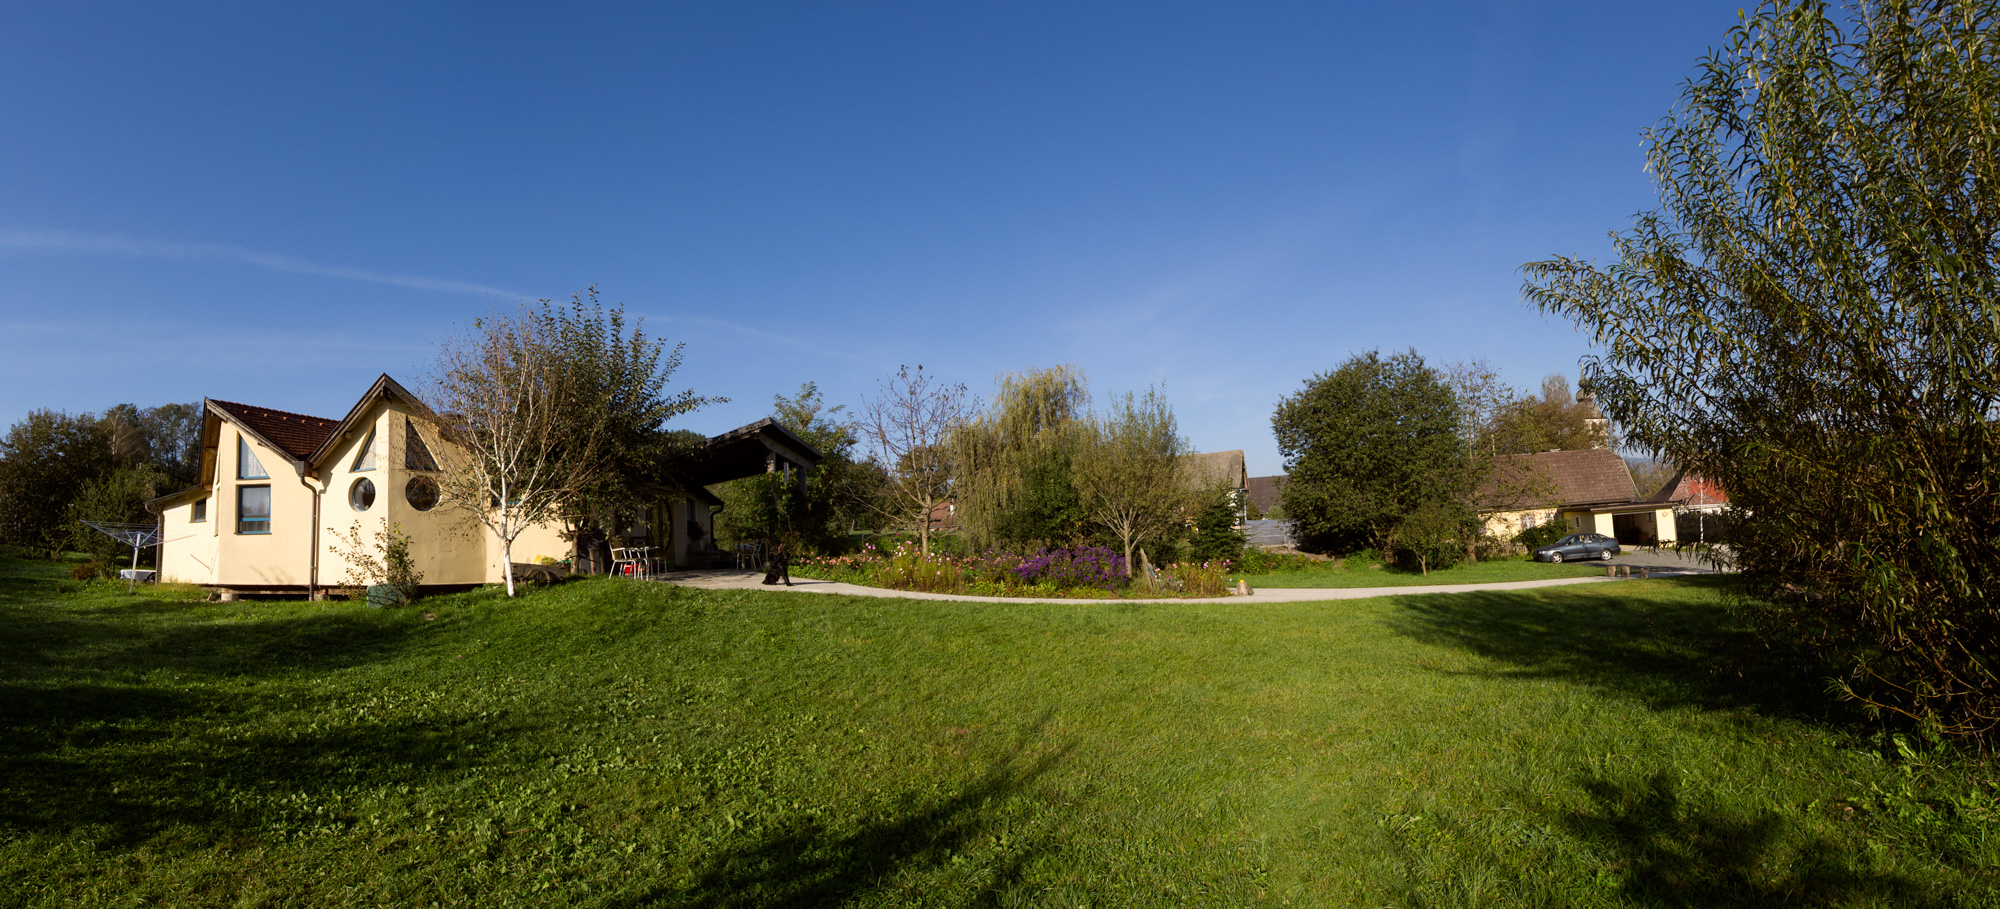 Geburtshaus panoramic-big